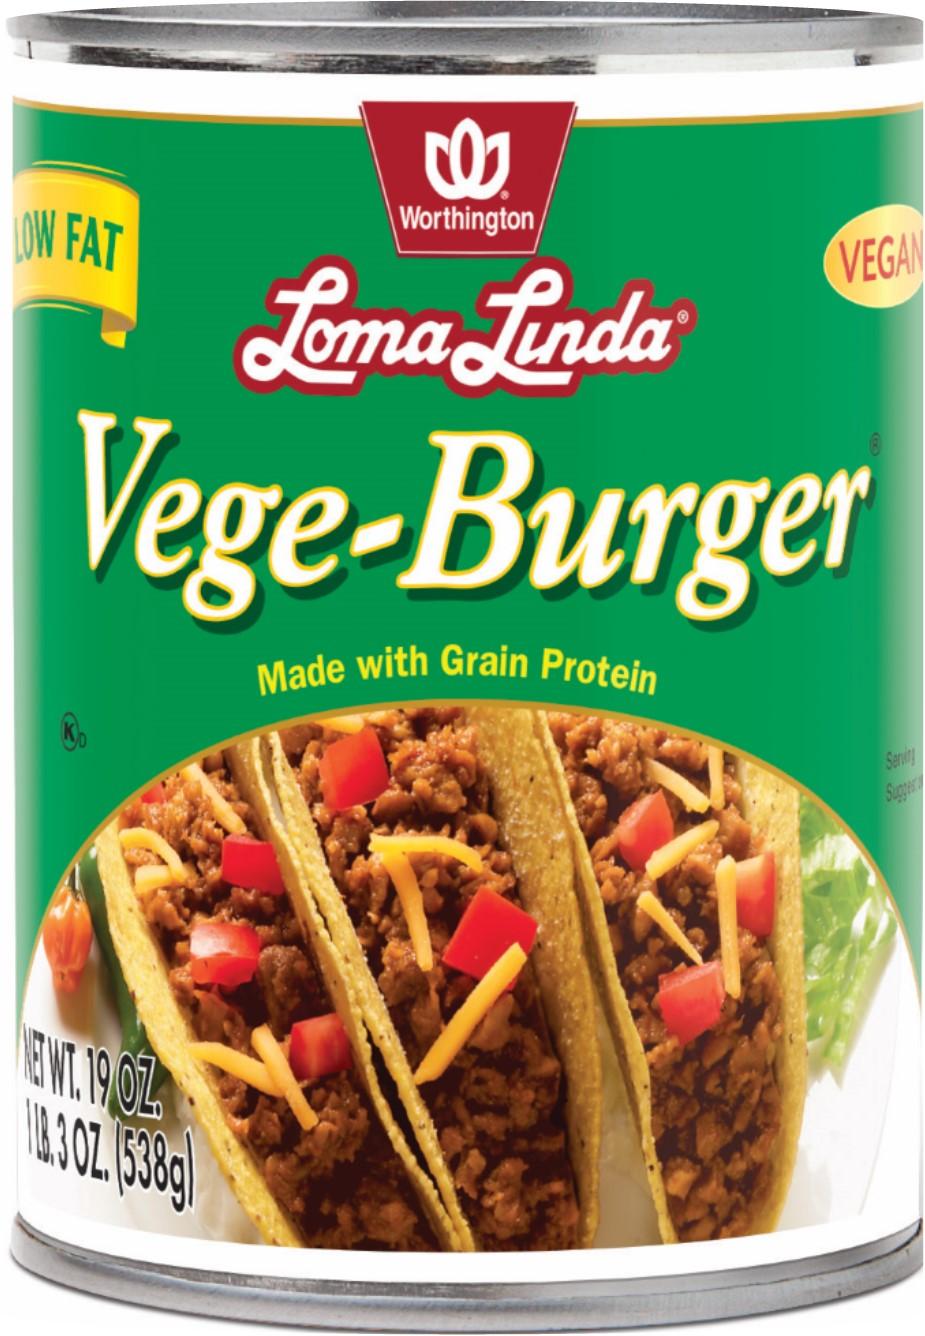 VEGE BURGER LOW FAT LOMA LINDA,LOMA LINDA LF,4556100055